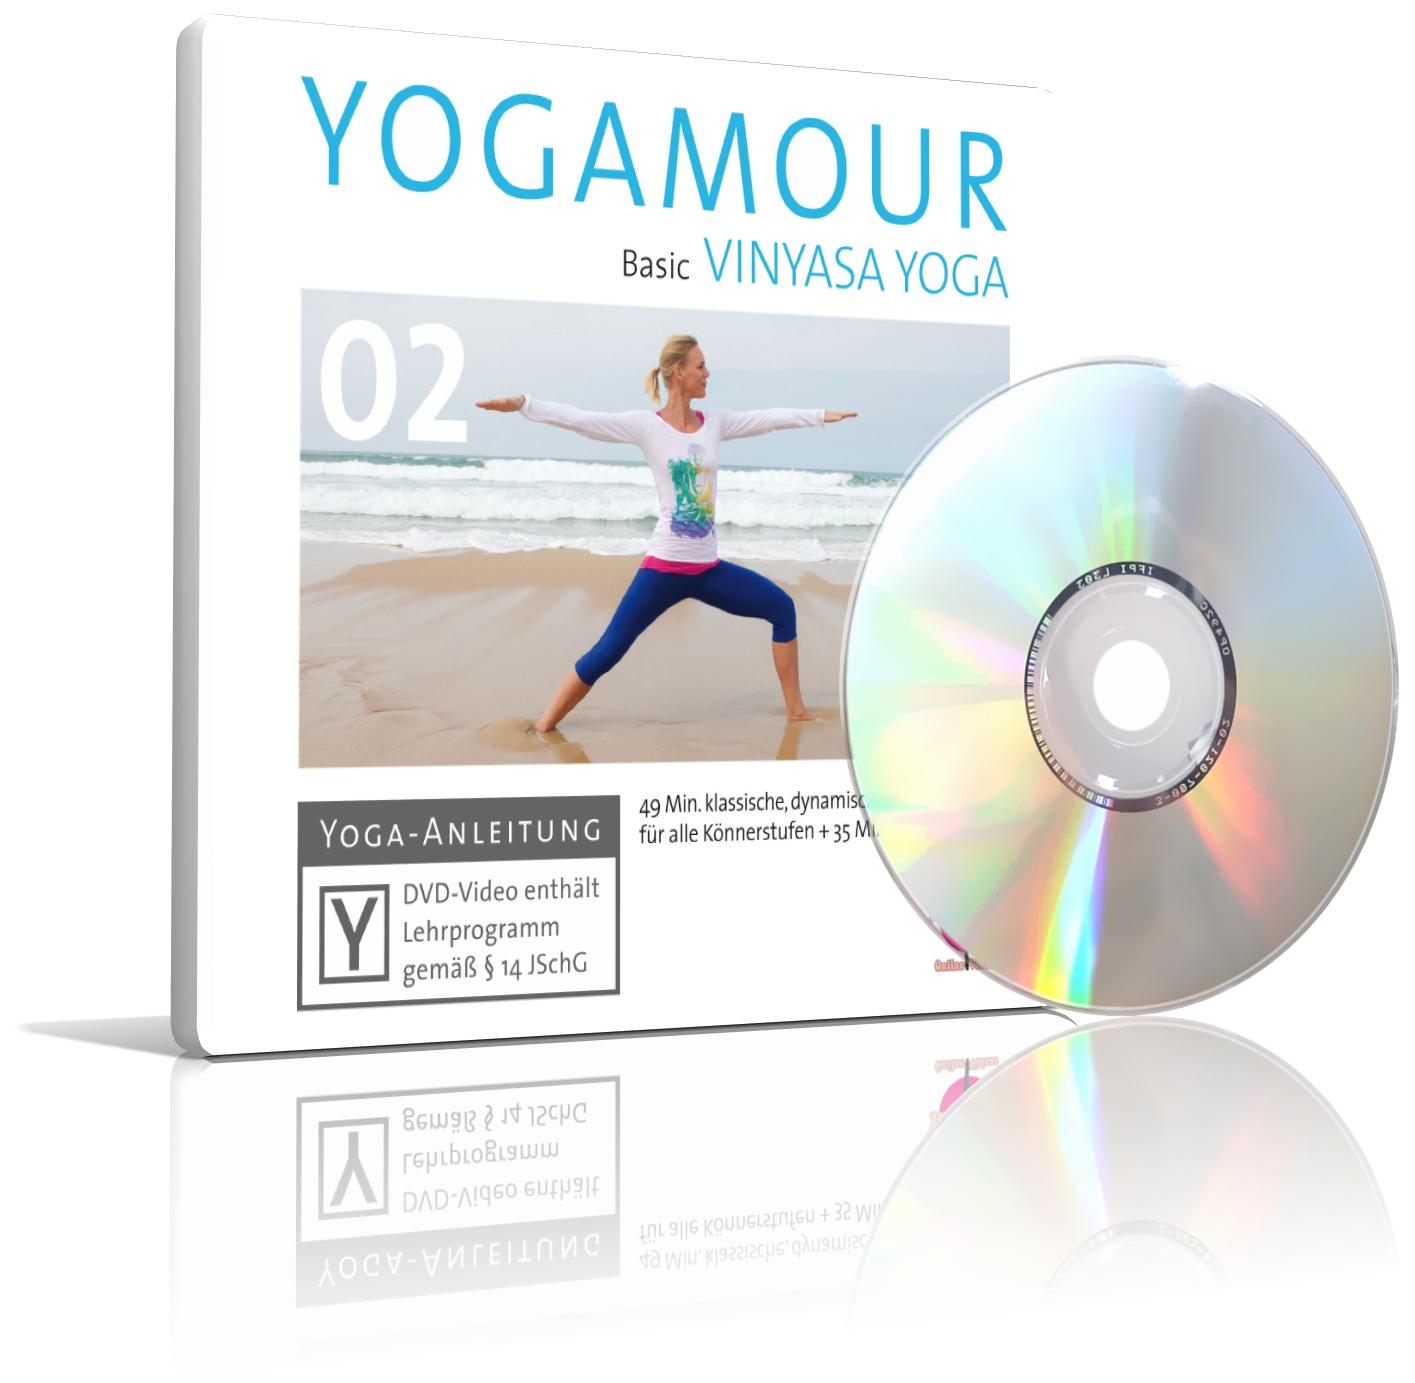 YOGAMOUR 02 Basic VINYASA YOGA von YOGAMOUR (DVD)